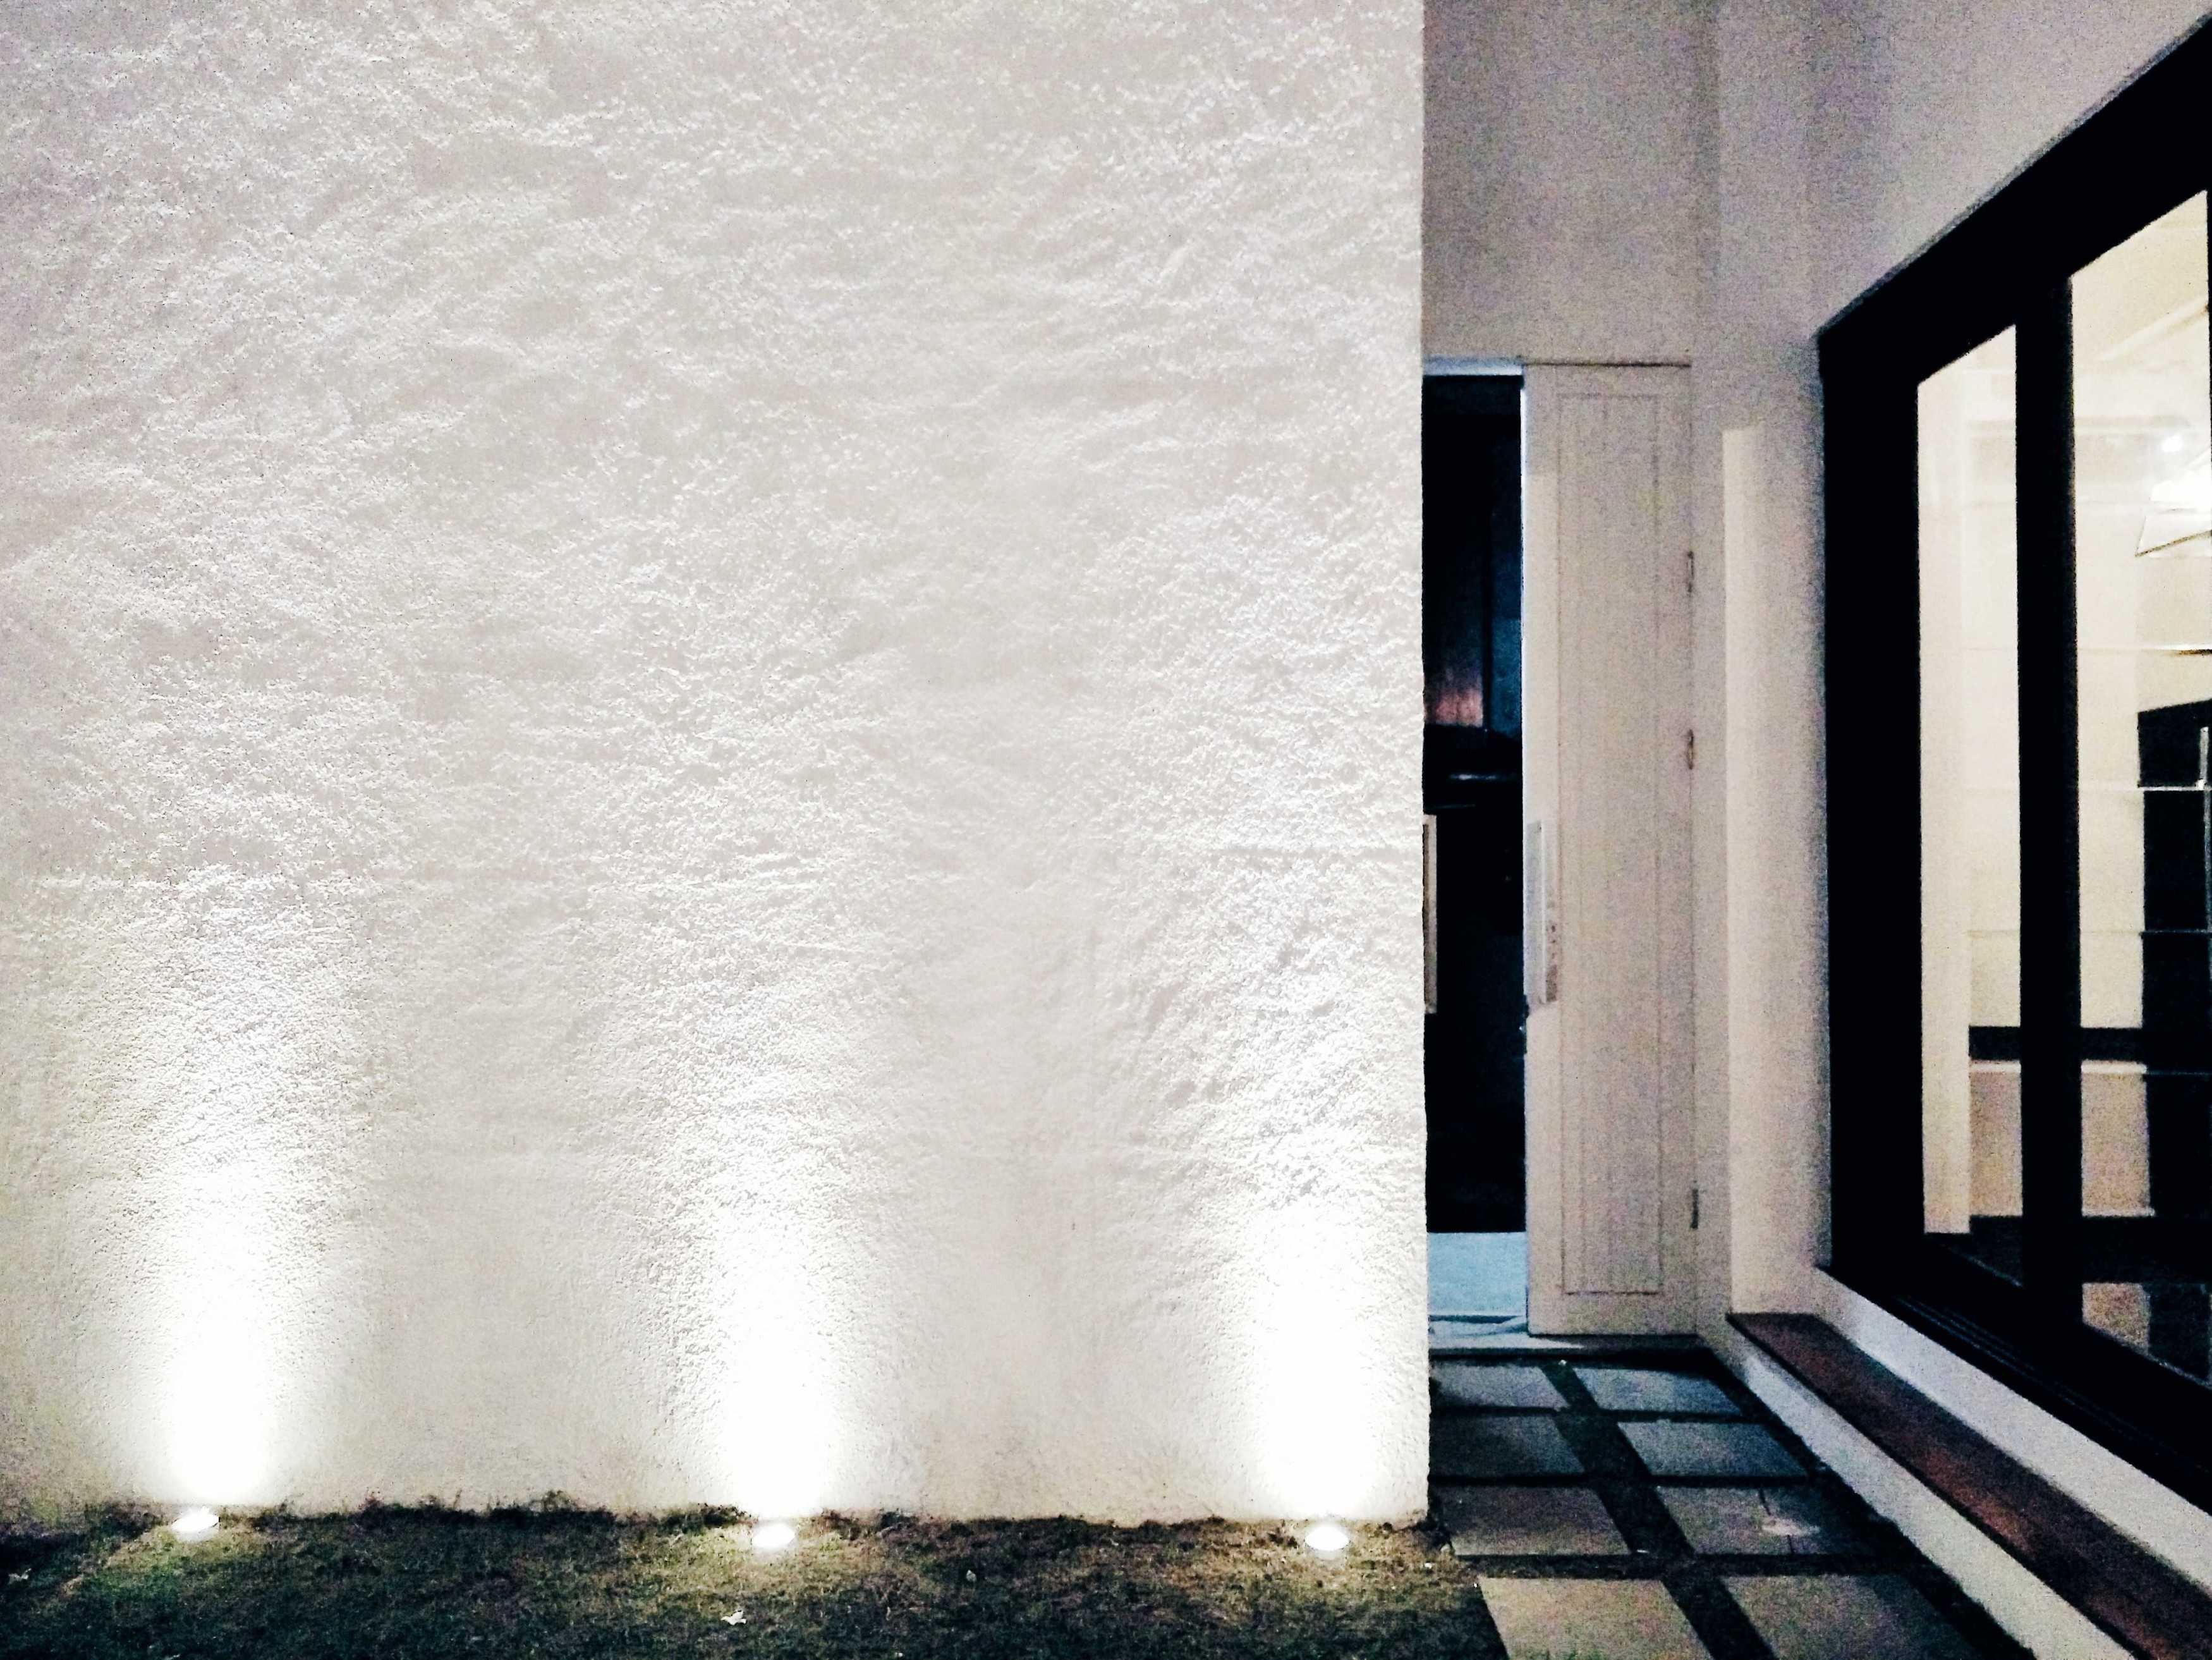 Padupadani Architect Martalena Green House Pontianak, Kota Pontianak, Kalimantan Barat, Indonesia Pontianak, Kota Pontianak, Kalimantan Barat, Indonesia Img20170524122350490   37657